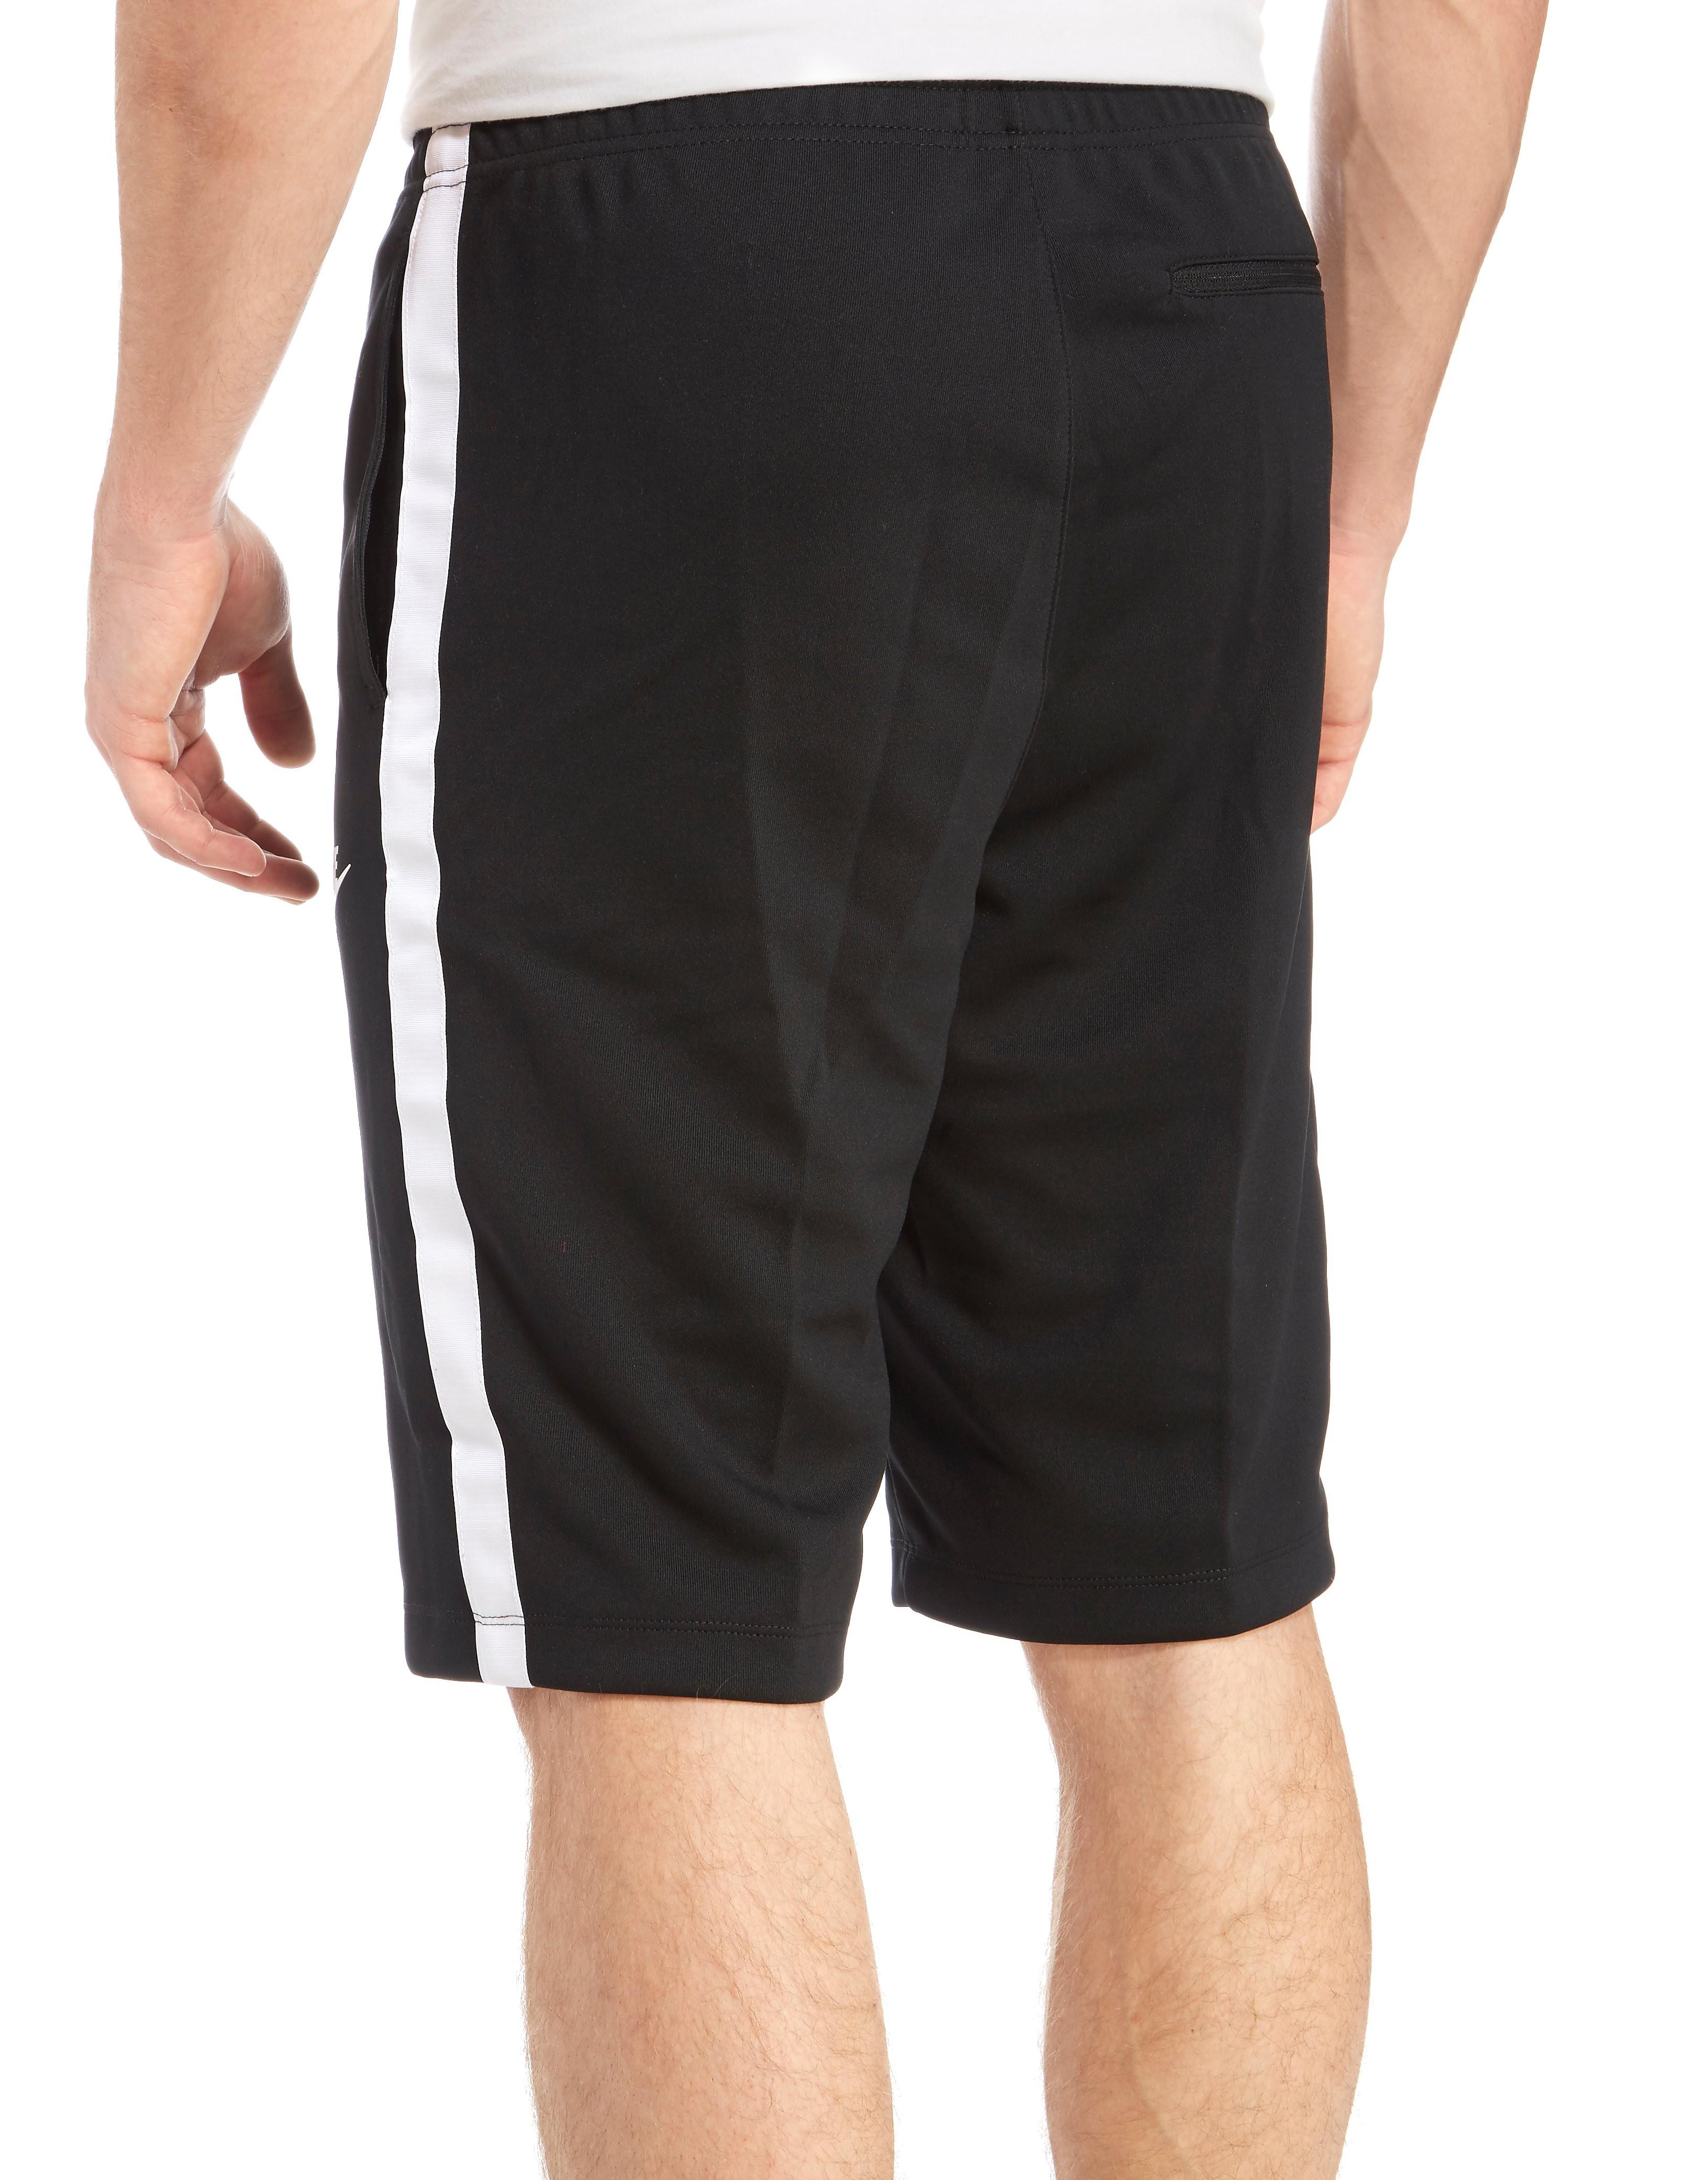 Nike Limitless Shorts